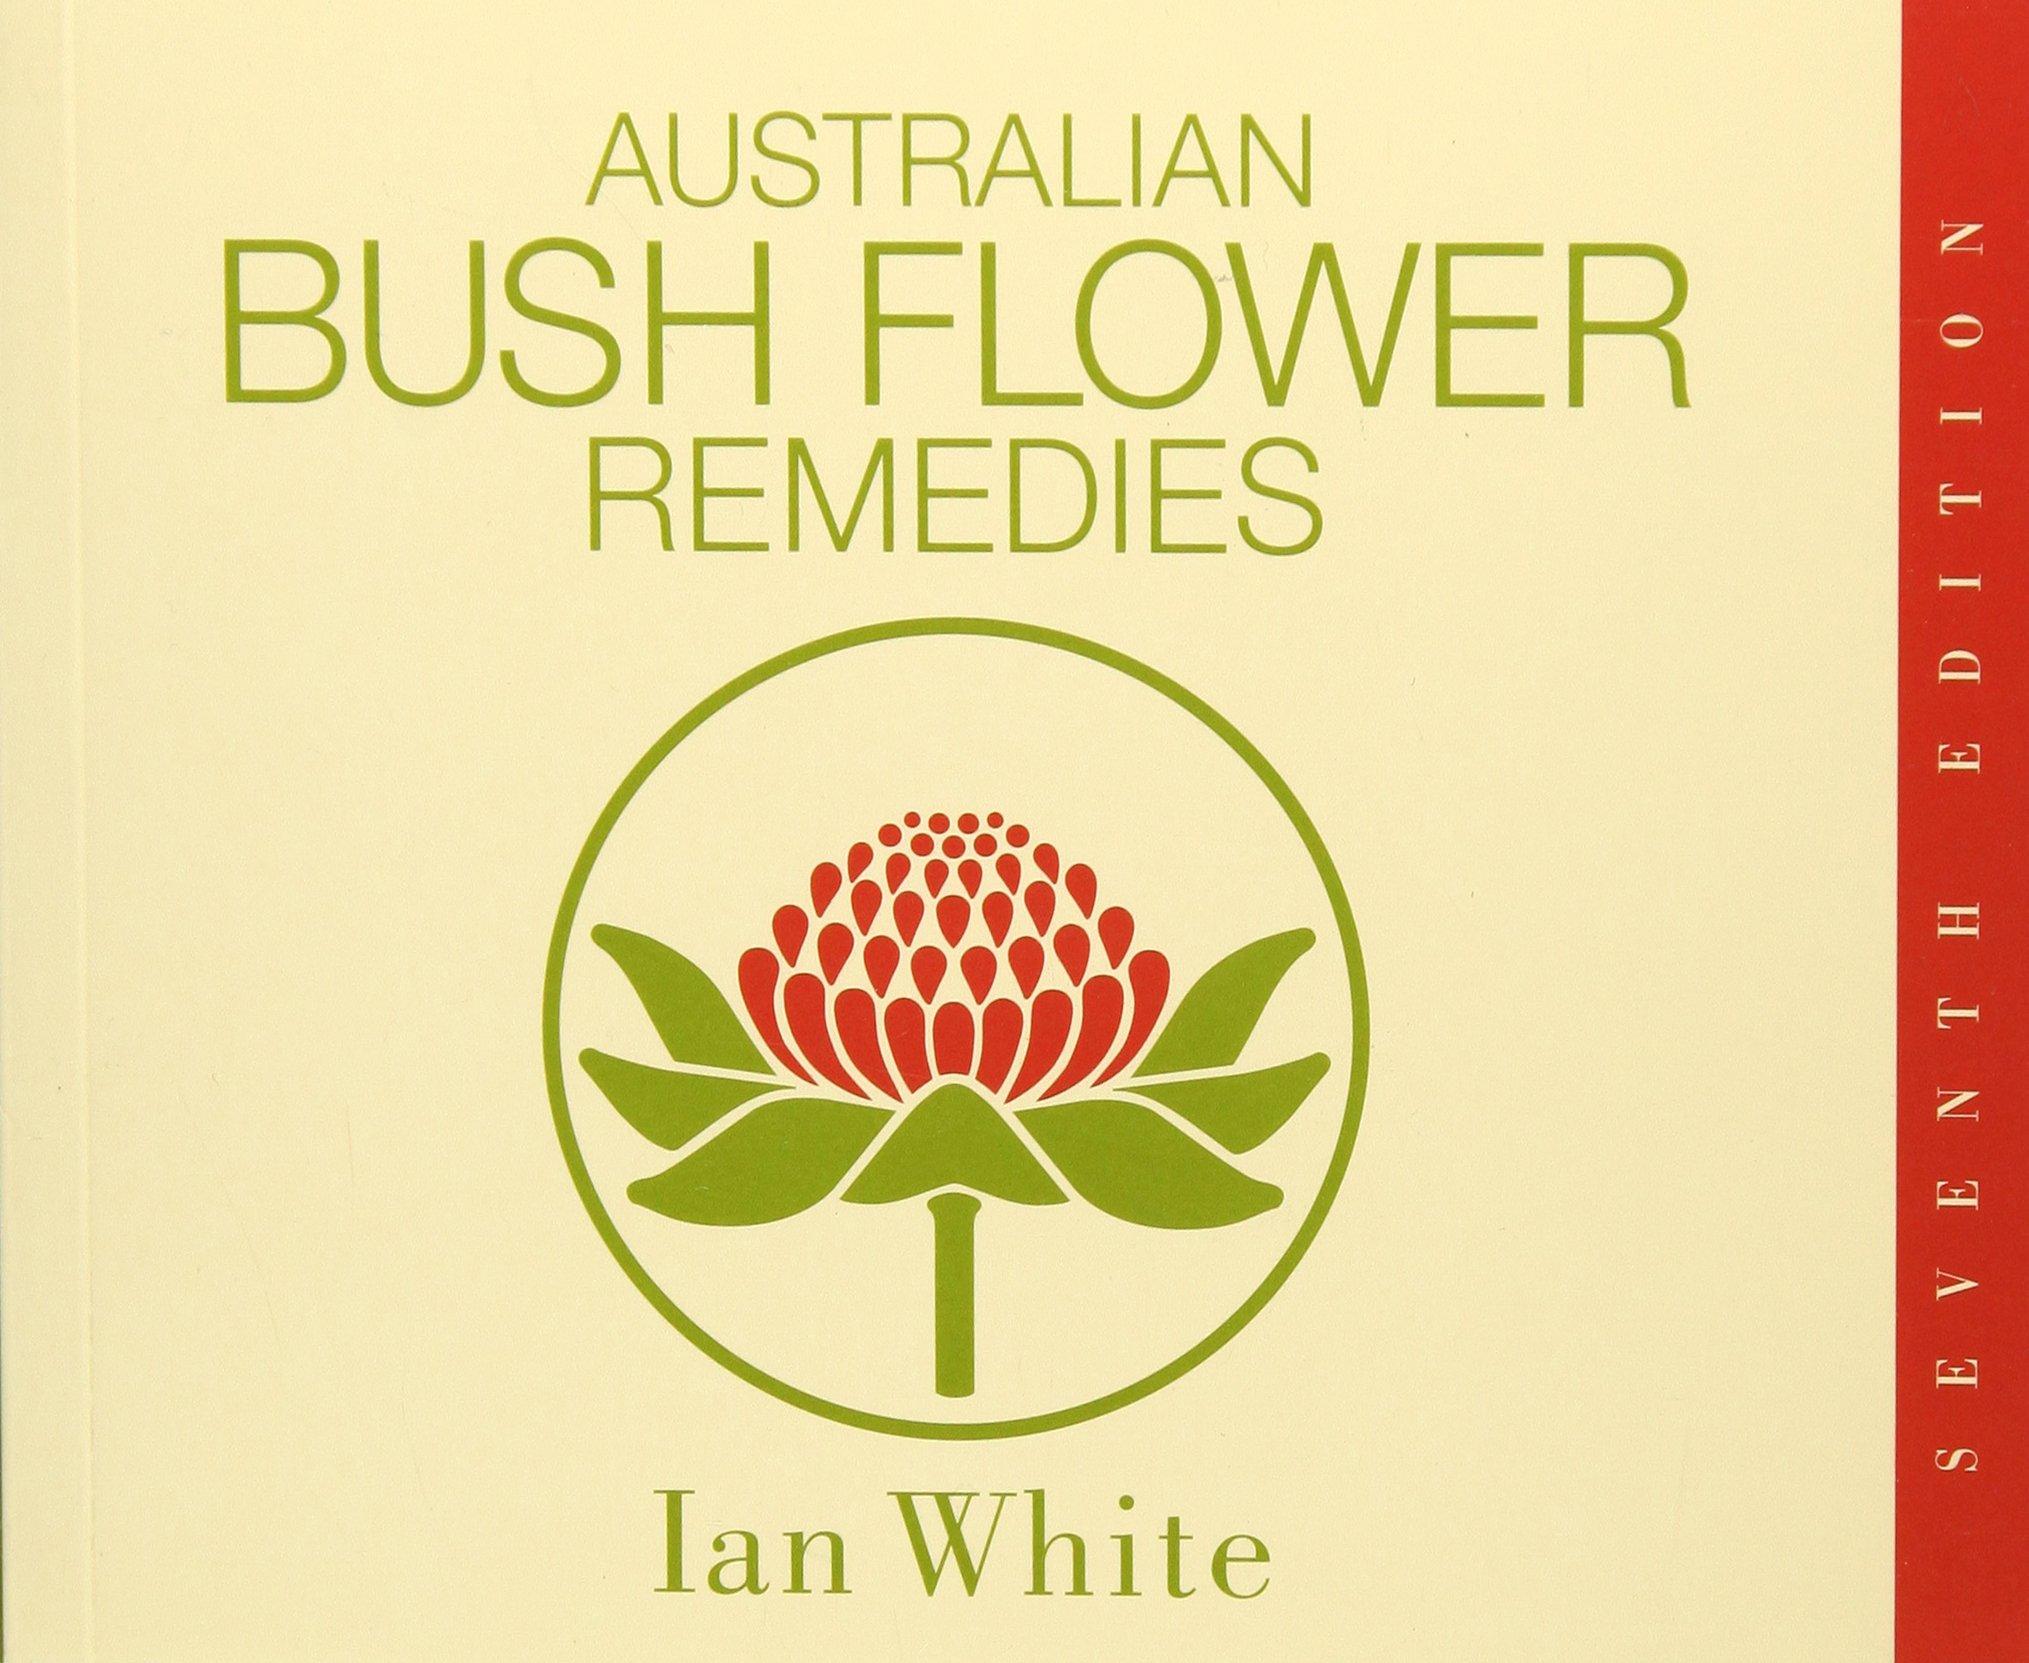 Australian Bush Flower Remedies Ian White 9780646284033 Amazon